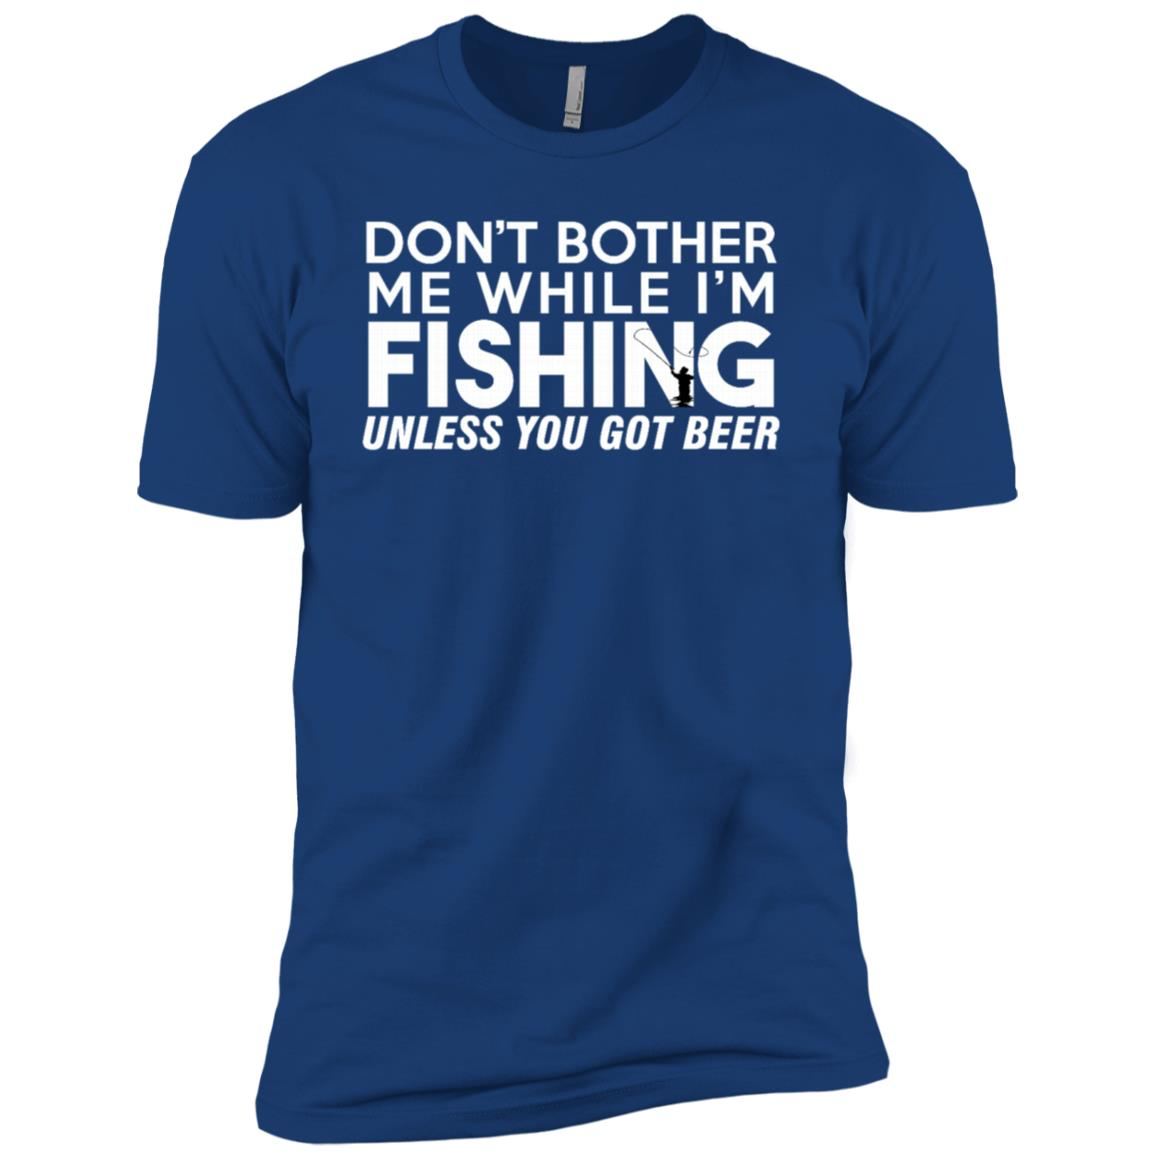 Fishing Funny Sarcasm Quotes Joke Hobbies Humor-1 Men Short Sleeve T-Shirt